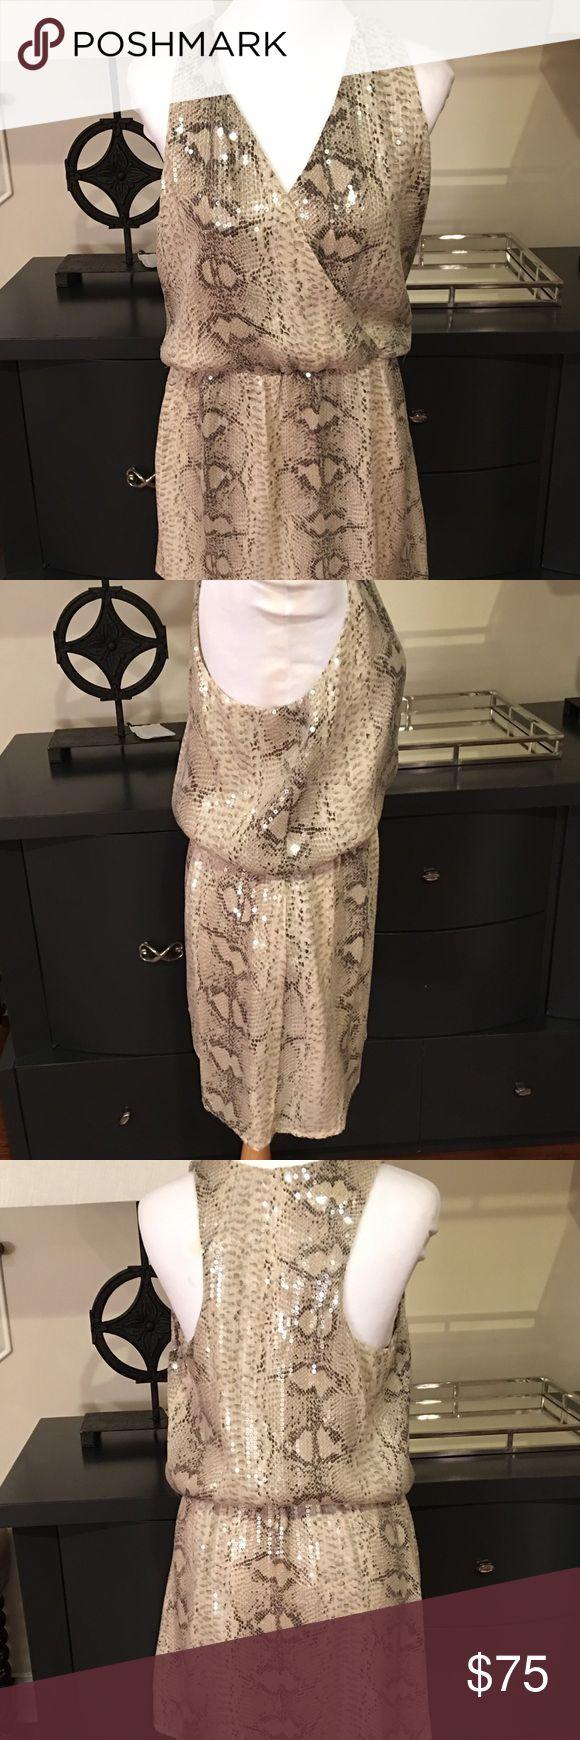 Parker Animal Print Sequin Dress Brand new. Does not appear to have been worn. V neck line, all over Sequin embellishments Parker Dresses